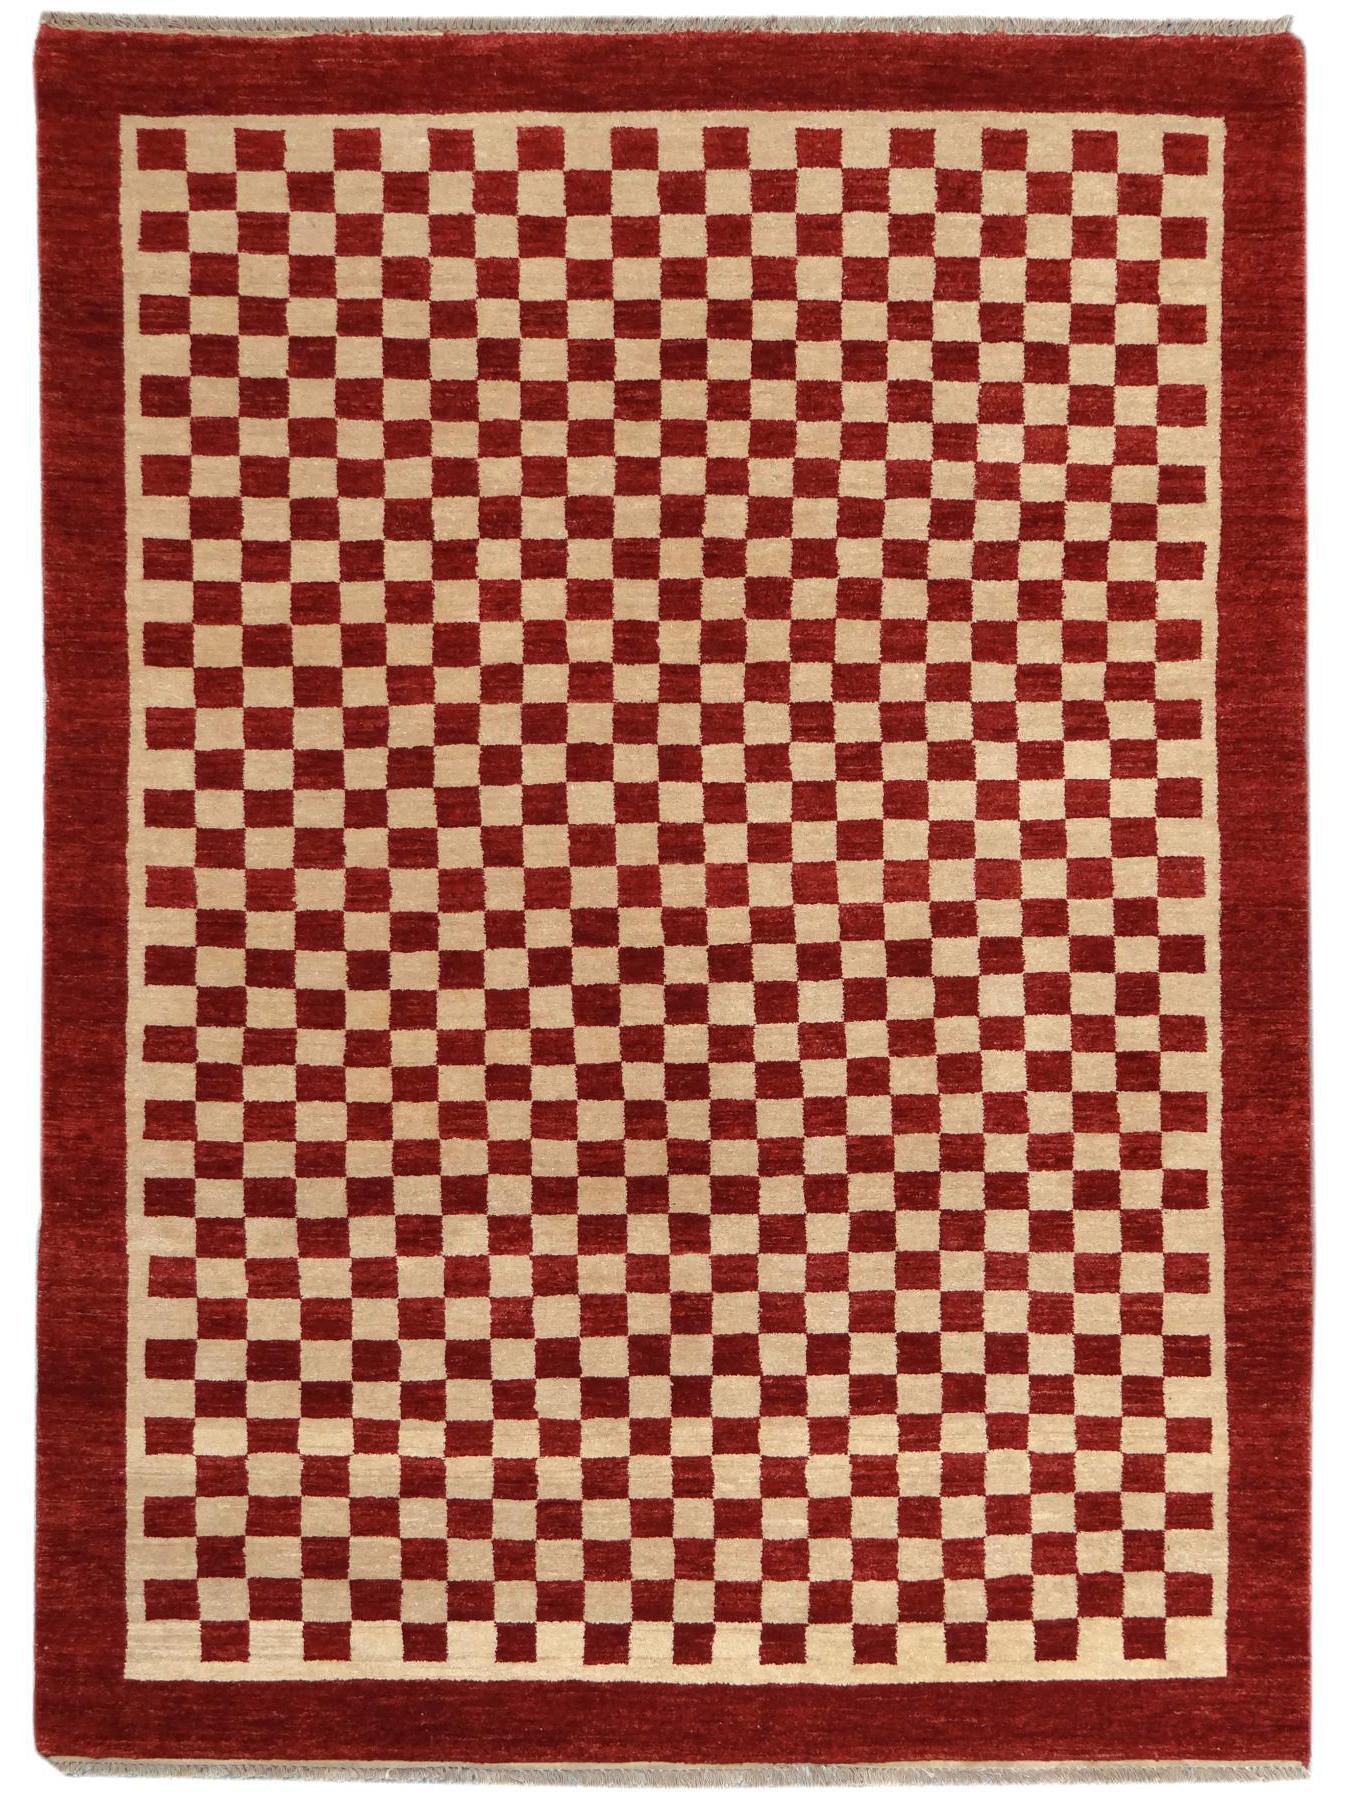 Ethnic carpets - TIMUR-EMOTION CHESS